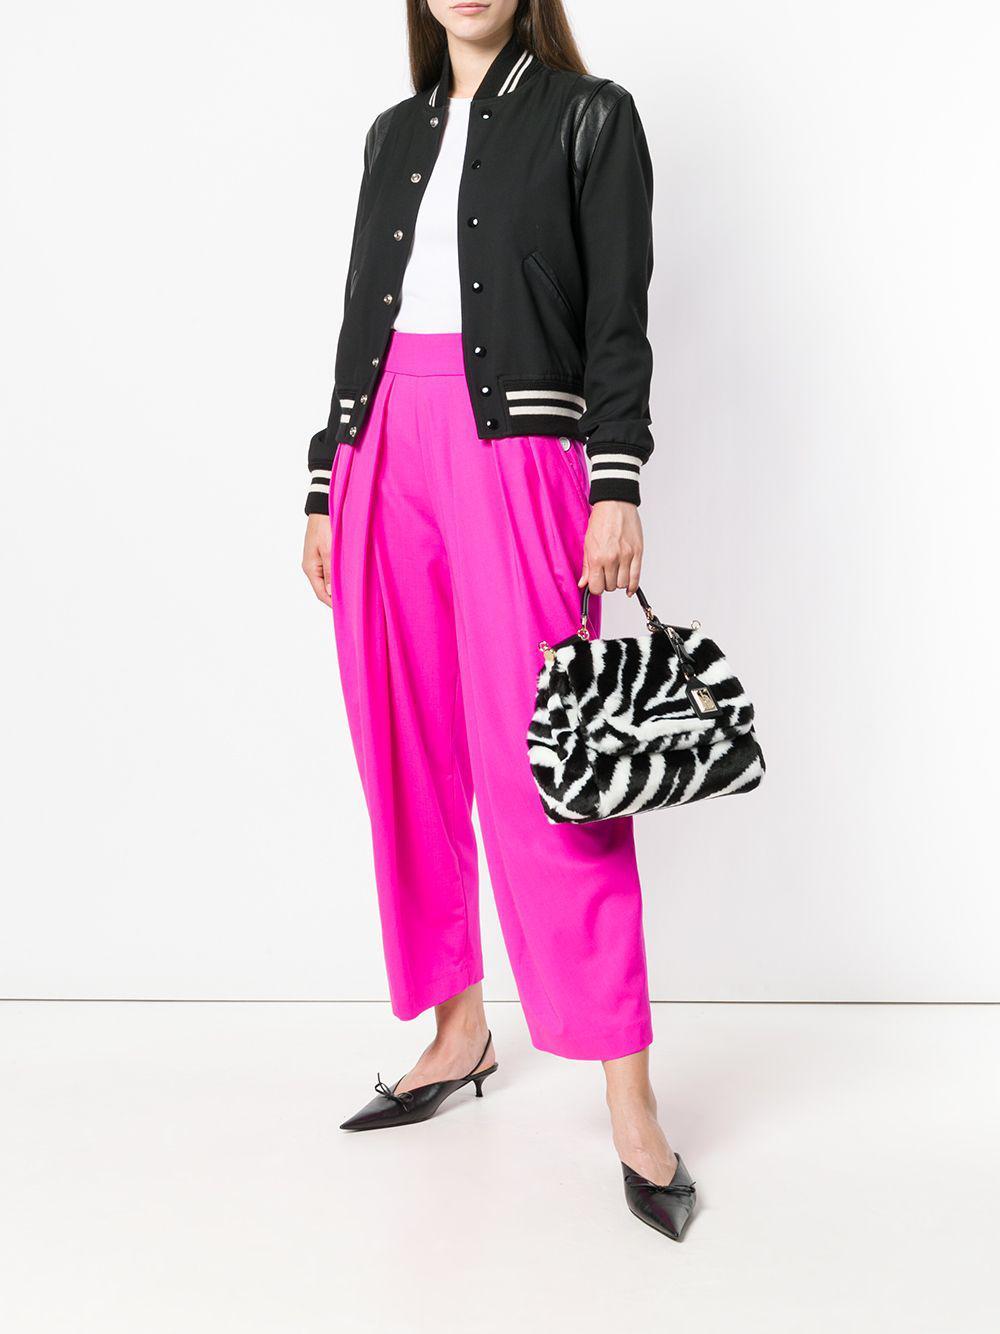 bc0740746c8c Dolce   Gabbana - Black Zebra Print Sicily Bag - Lyst. View fullscreen